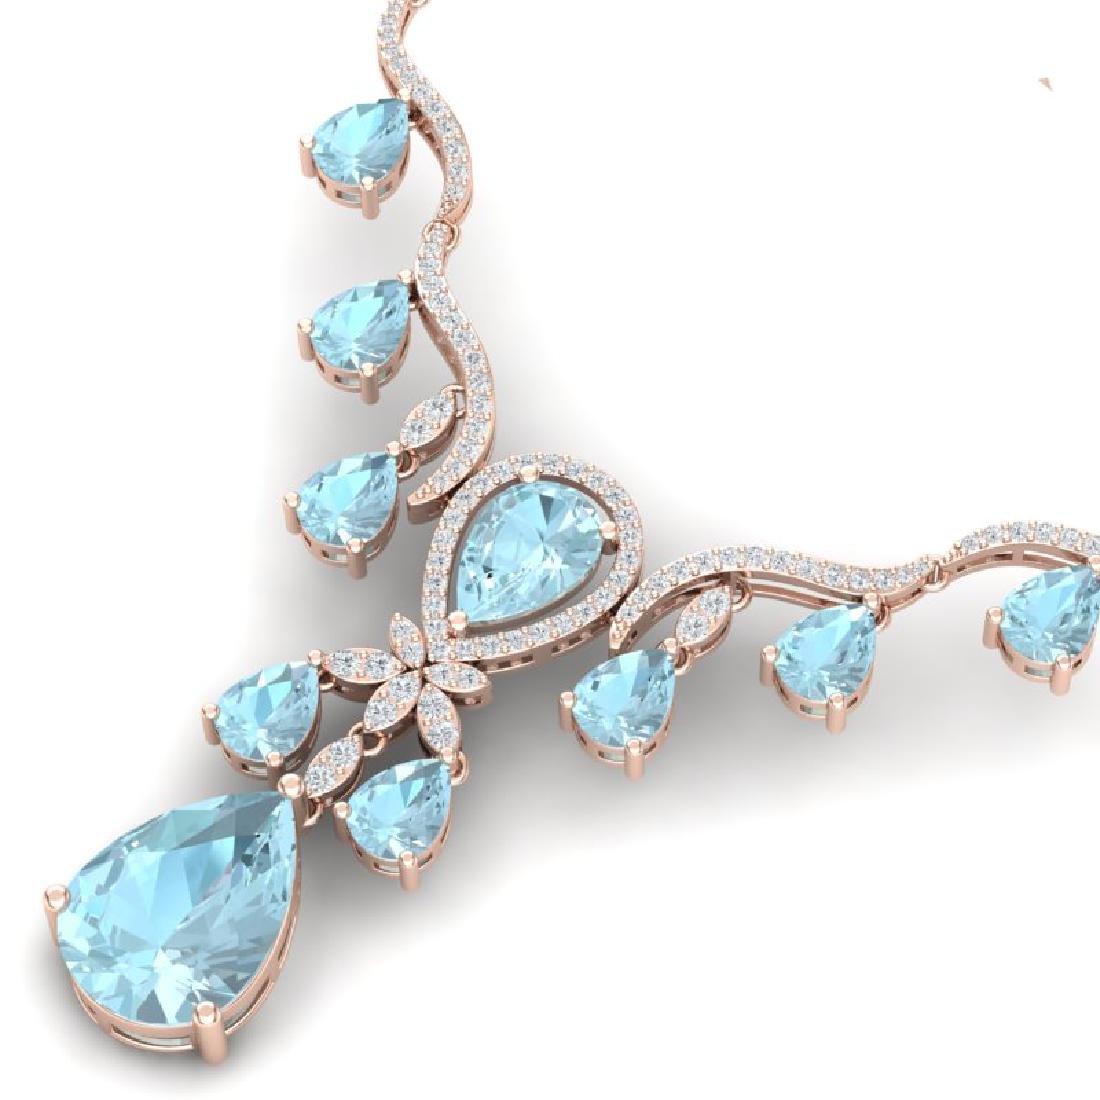 38.14 CTW Royalty Sky Topaz & VS Diamond Necklace 18K - 2